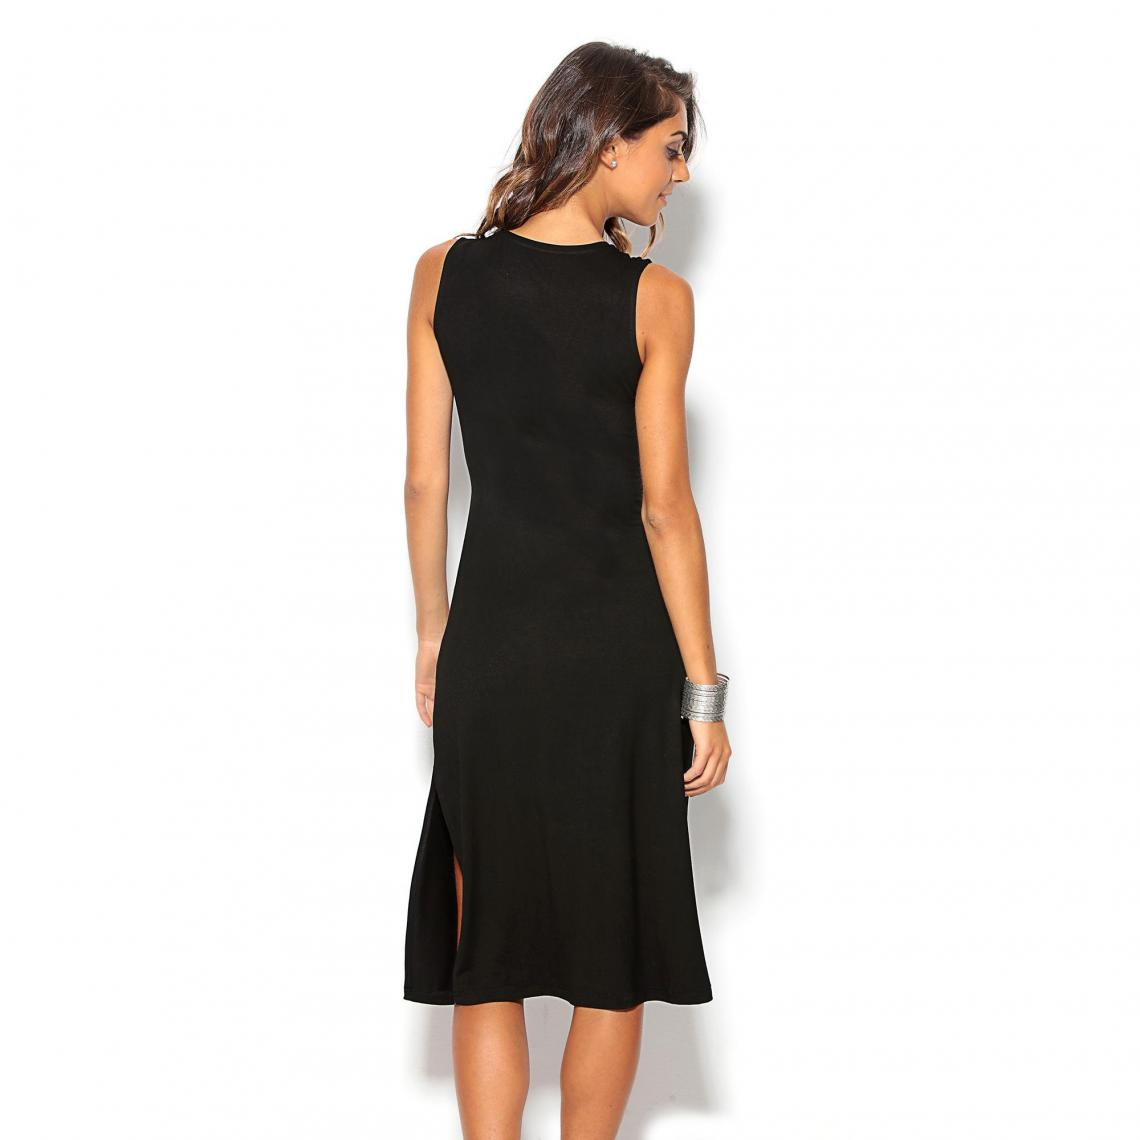 6cabe678201 Robe mi-longue femme - Noir